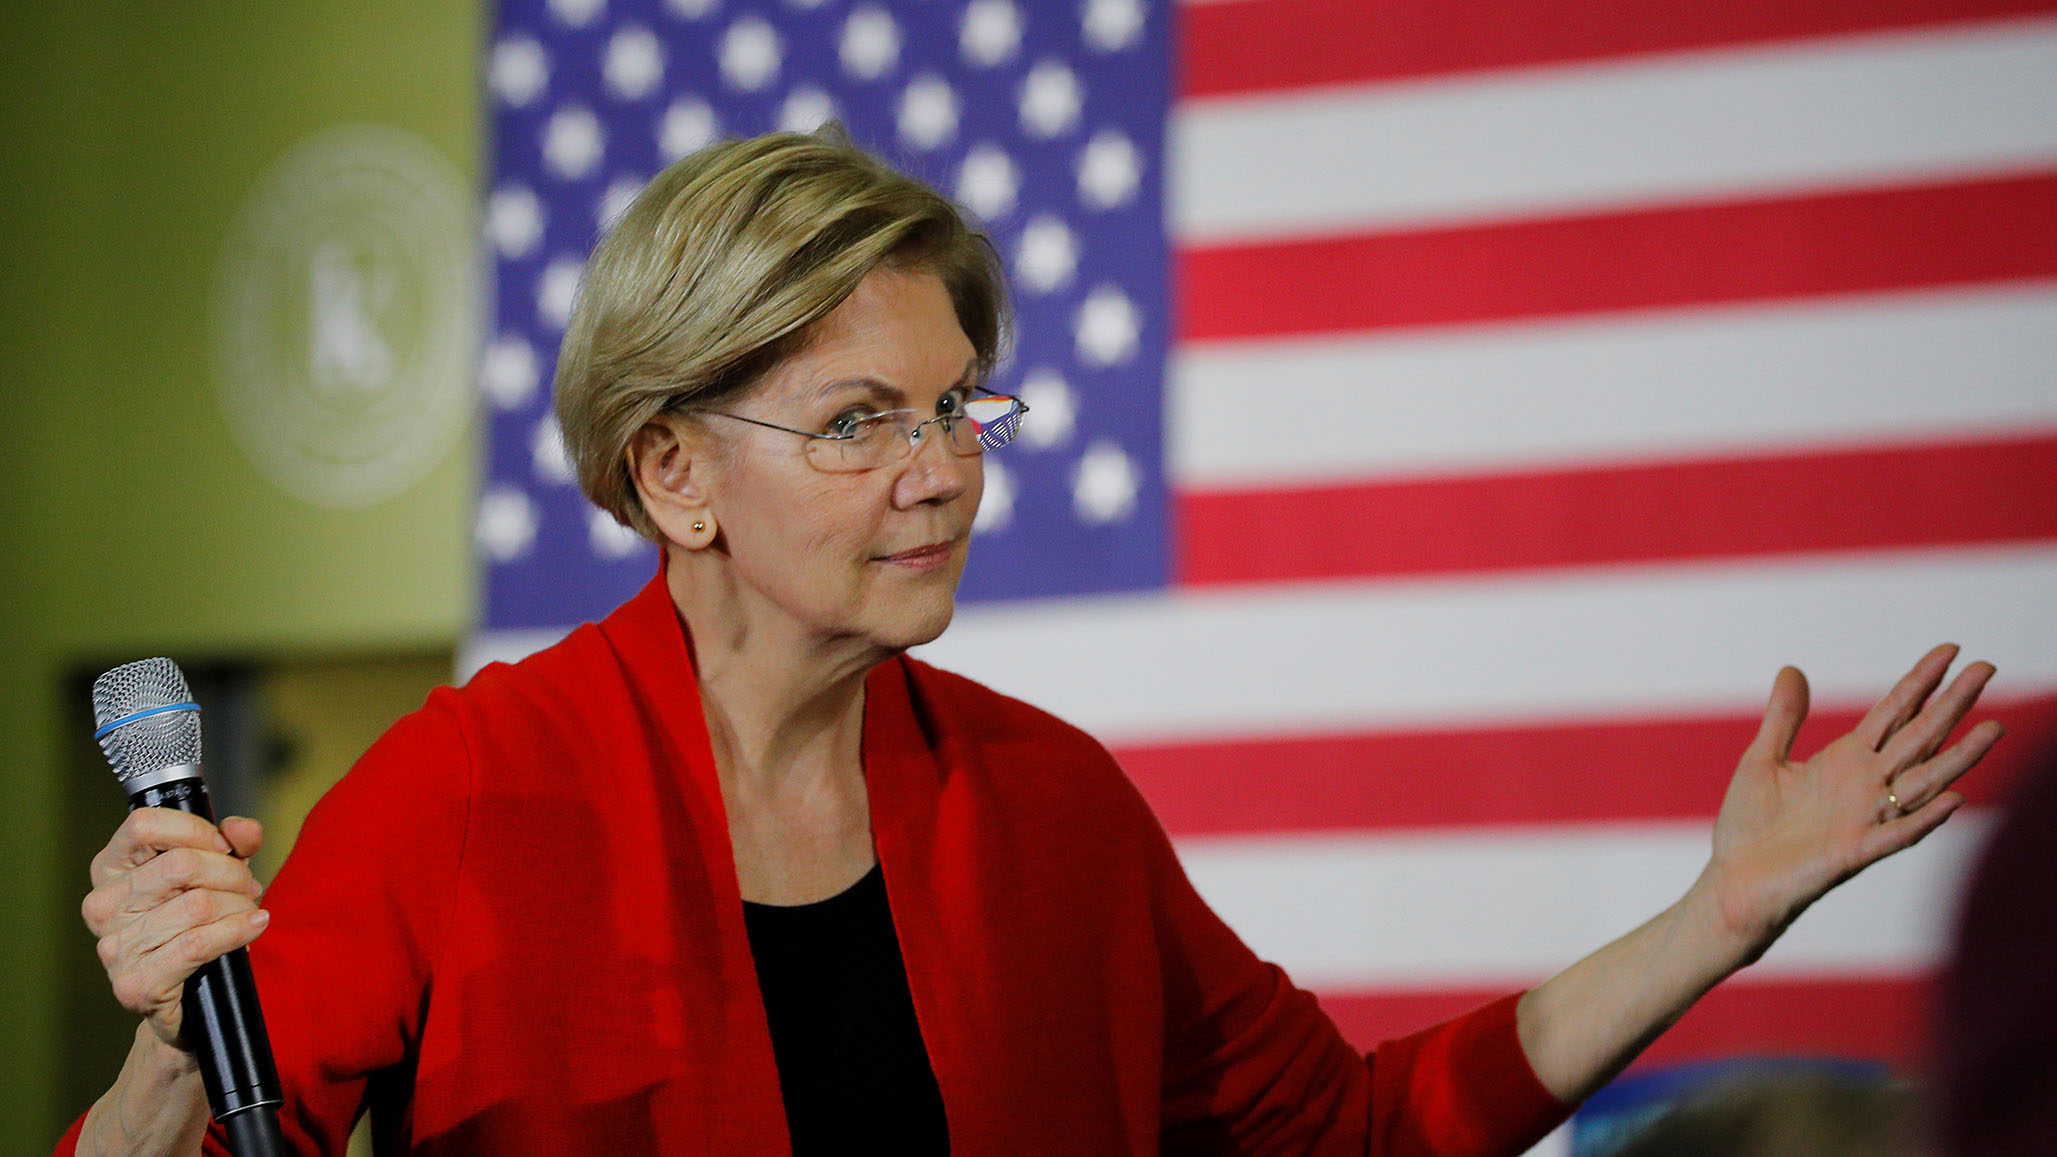 The Warren Fracking Ban Would Devastate America